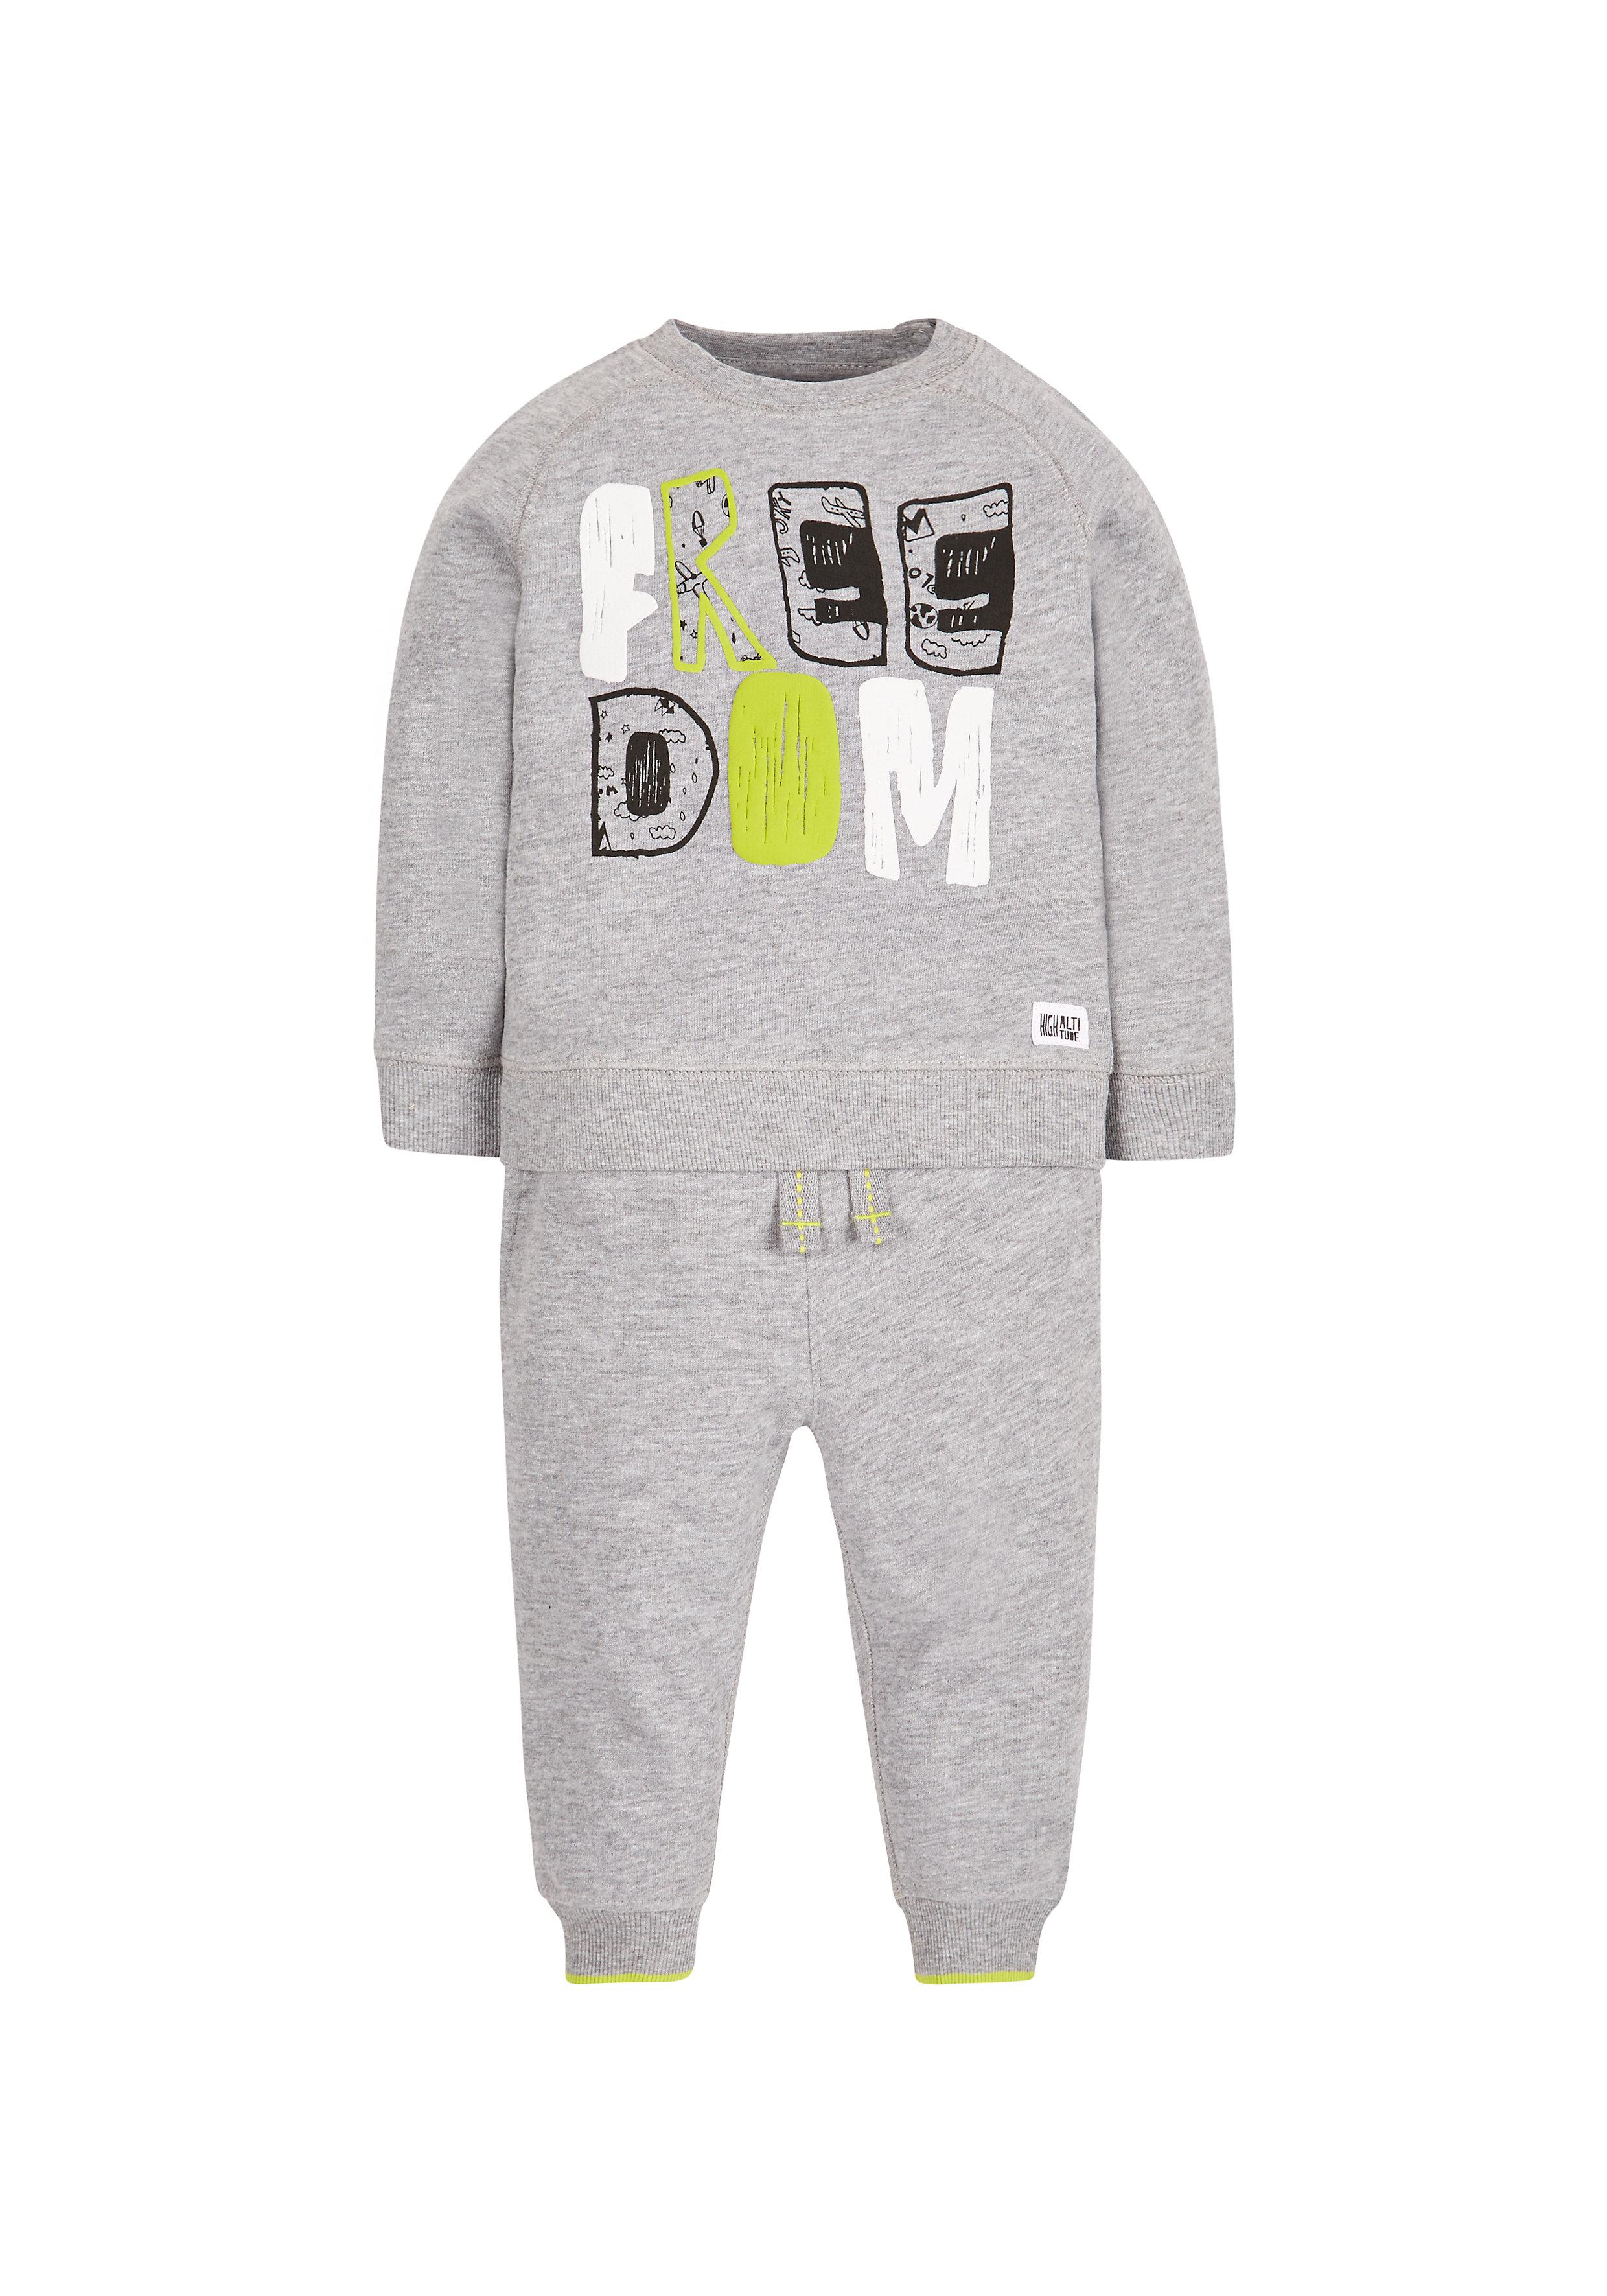 Mothercare   Boys Freedom Joggers Set - Grey